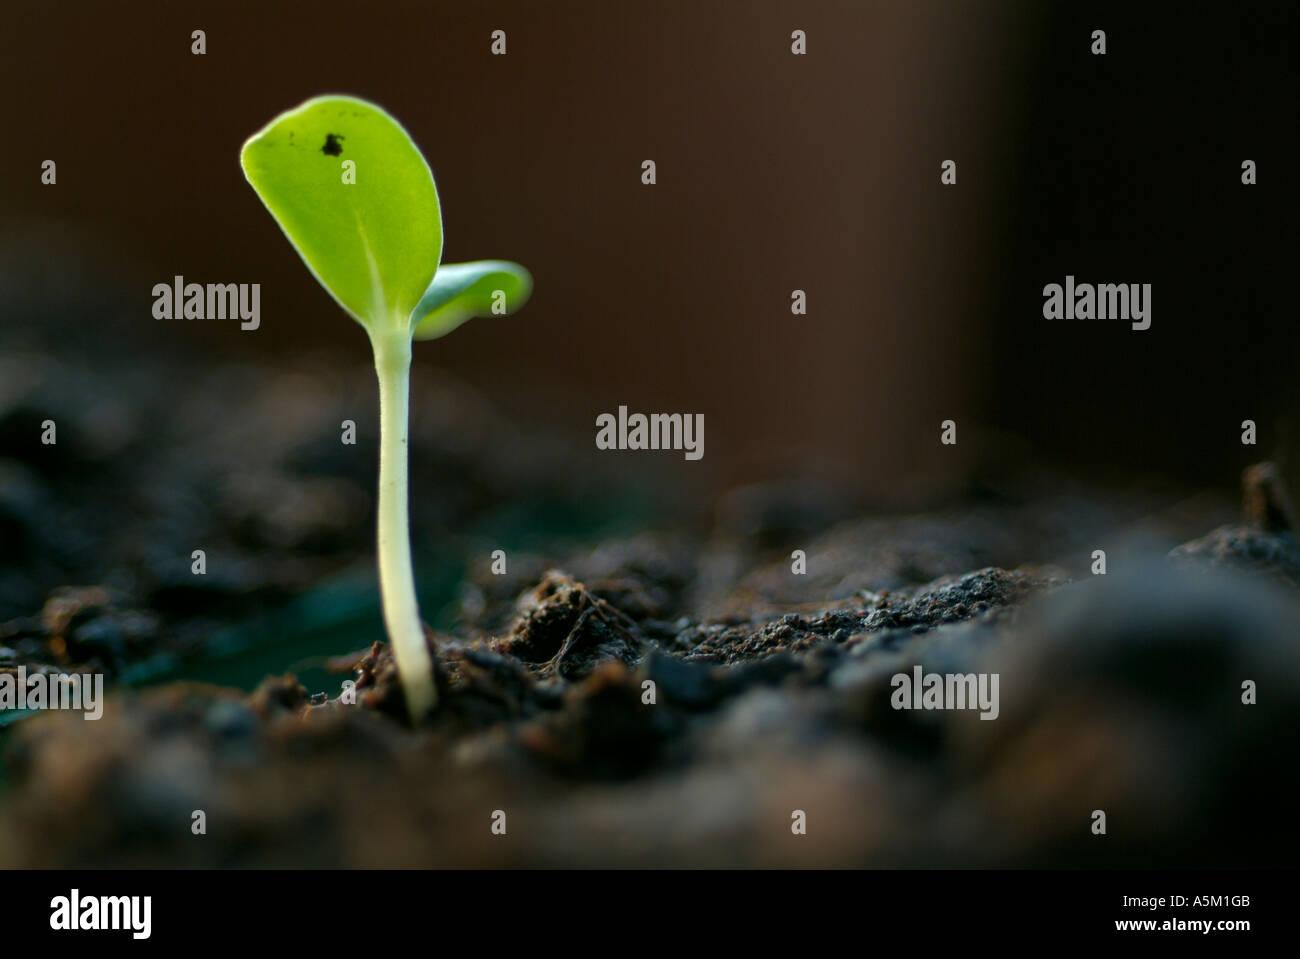 Une pousse verte Photo Stock